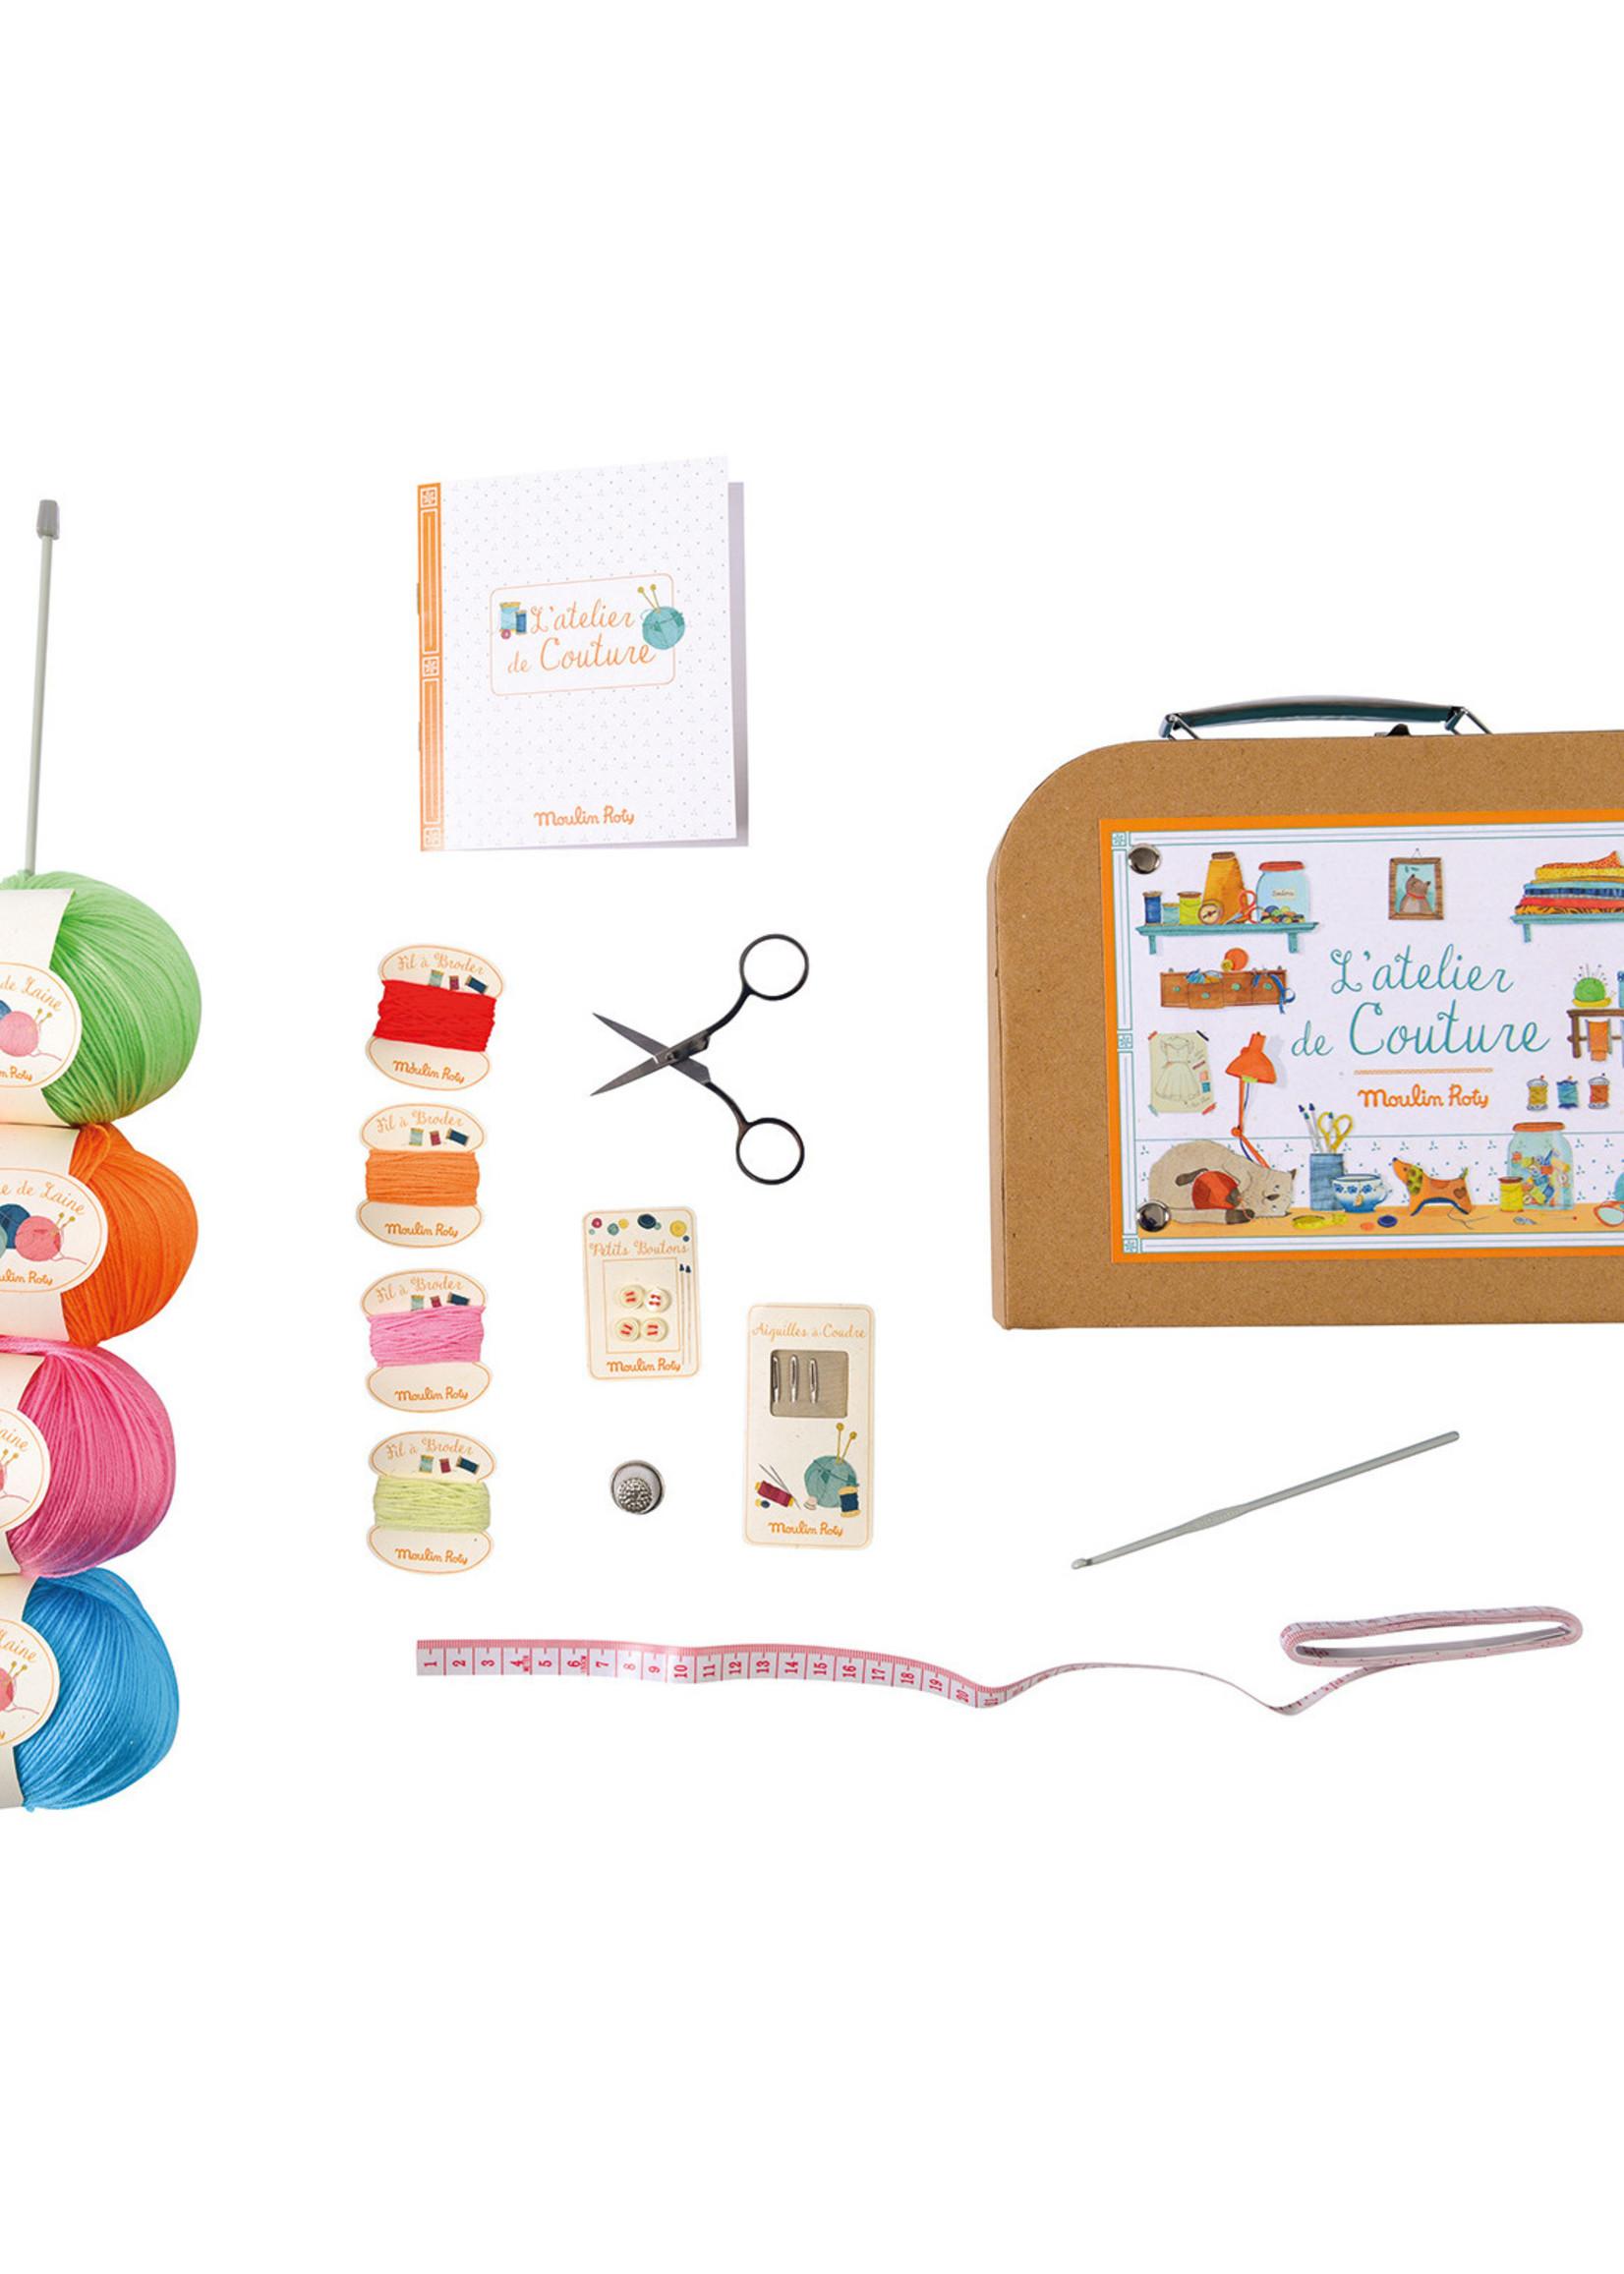 Mideer Mideer-ss21 L'atelier de Couture / Sewing Kit in Case   Code: 710404